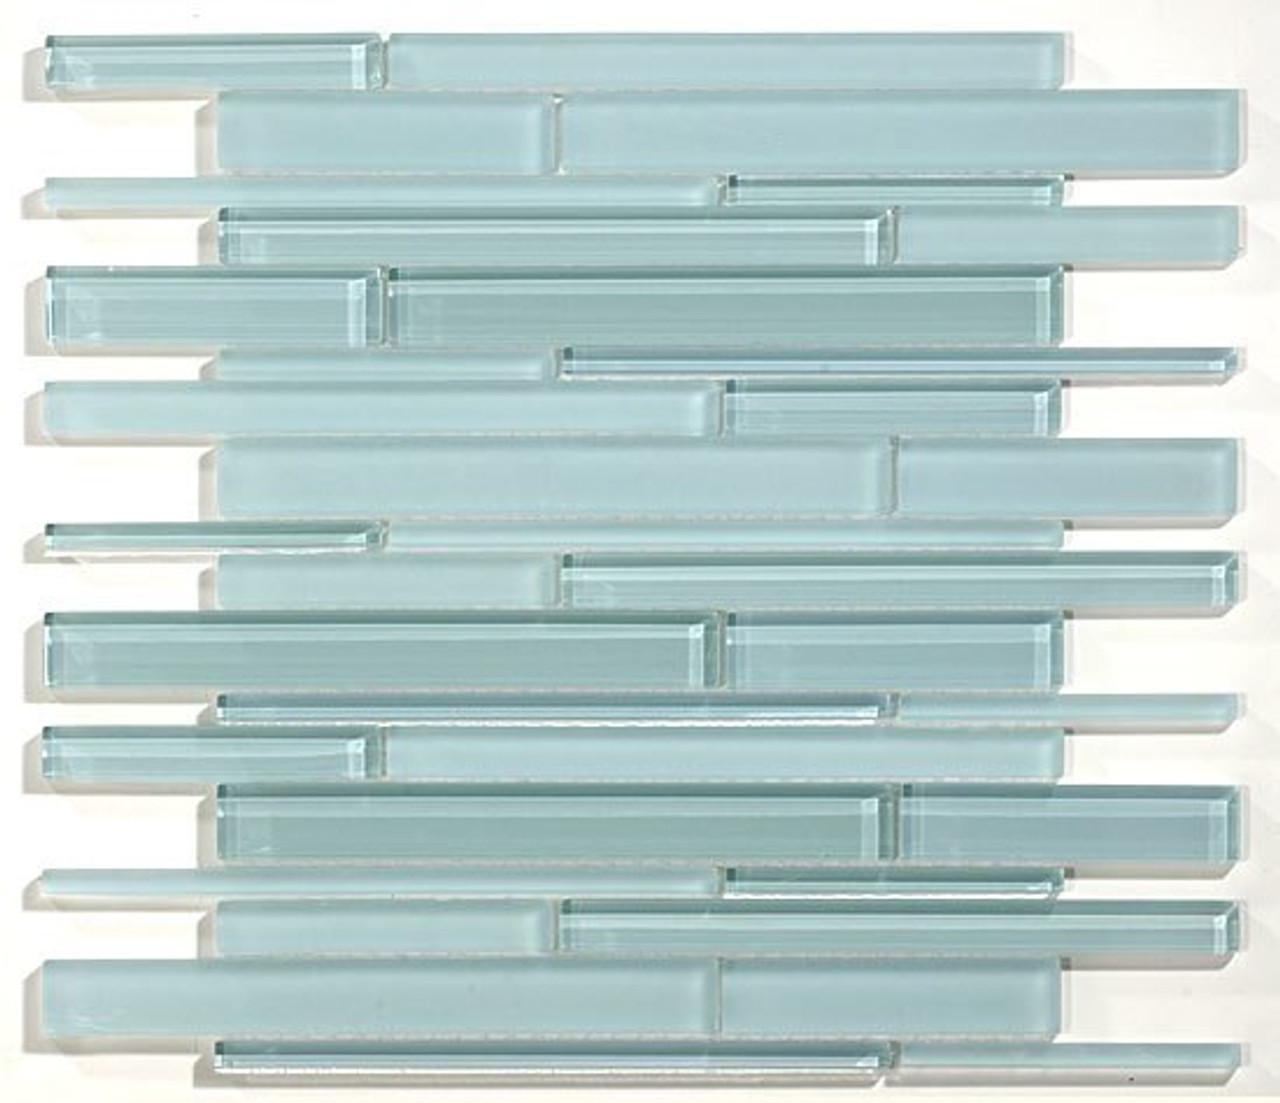 Bella Glass Tiles Cane Series Glass Tiles CN27 Grey Stone